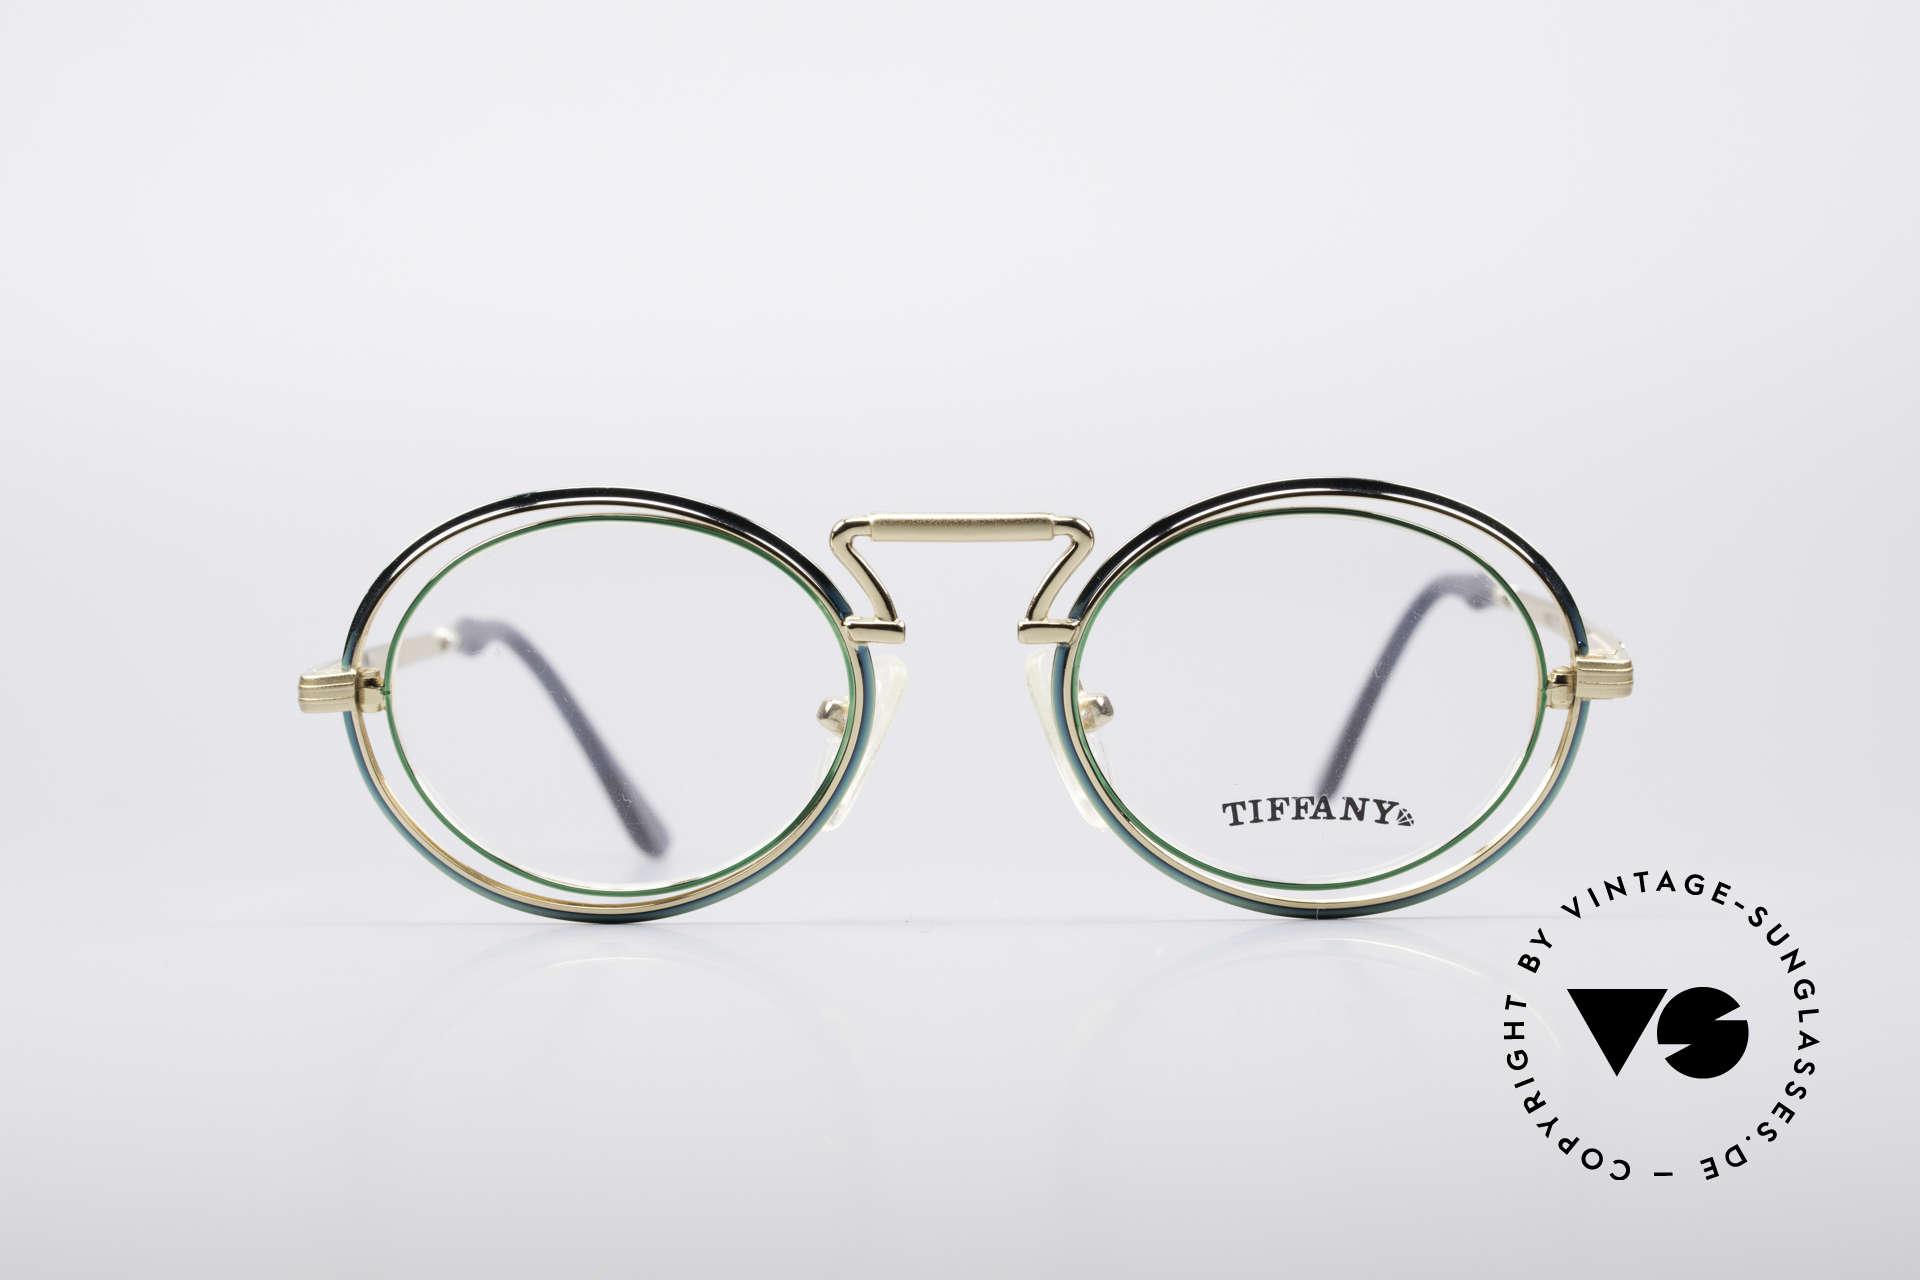 Brillen Tiffany T17 Vintage Juwelier Brille | Vintage Sunglasses